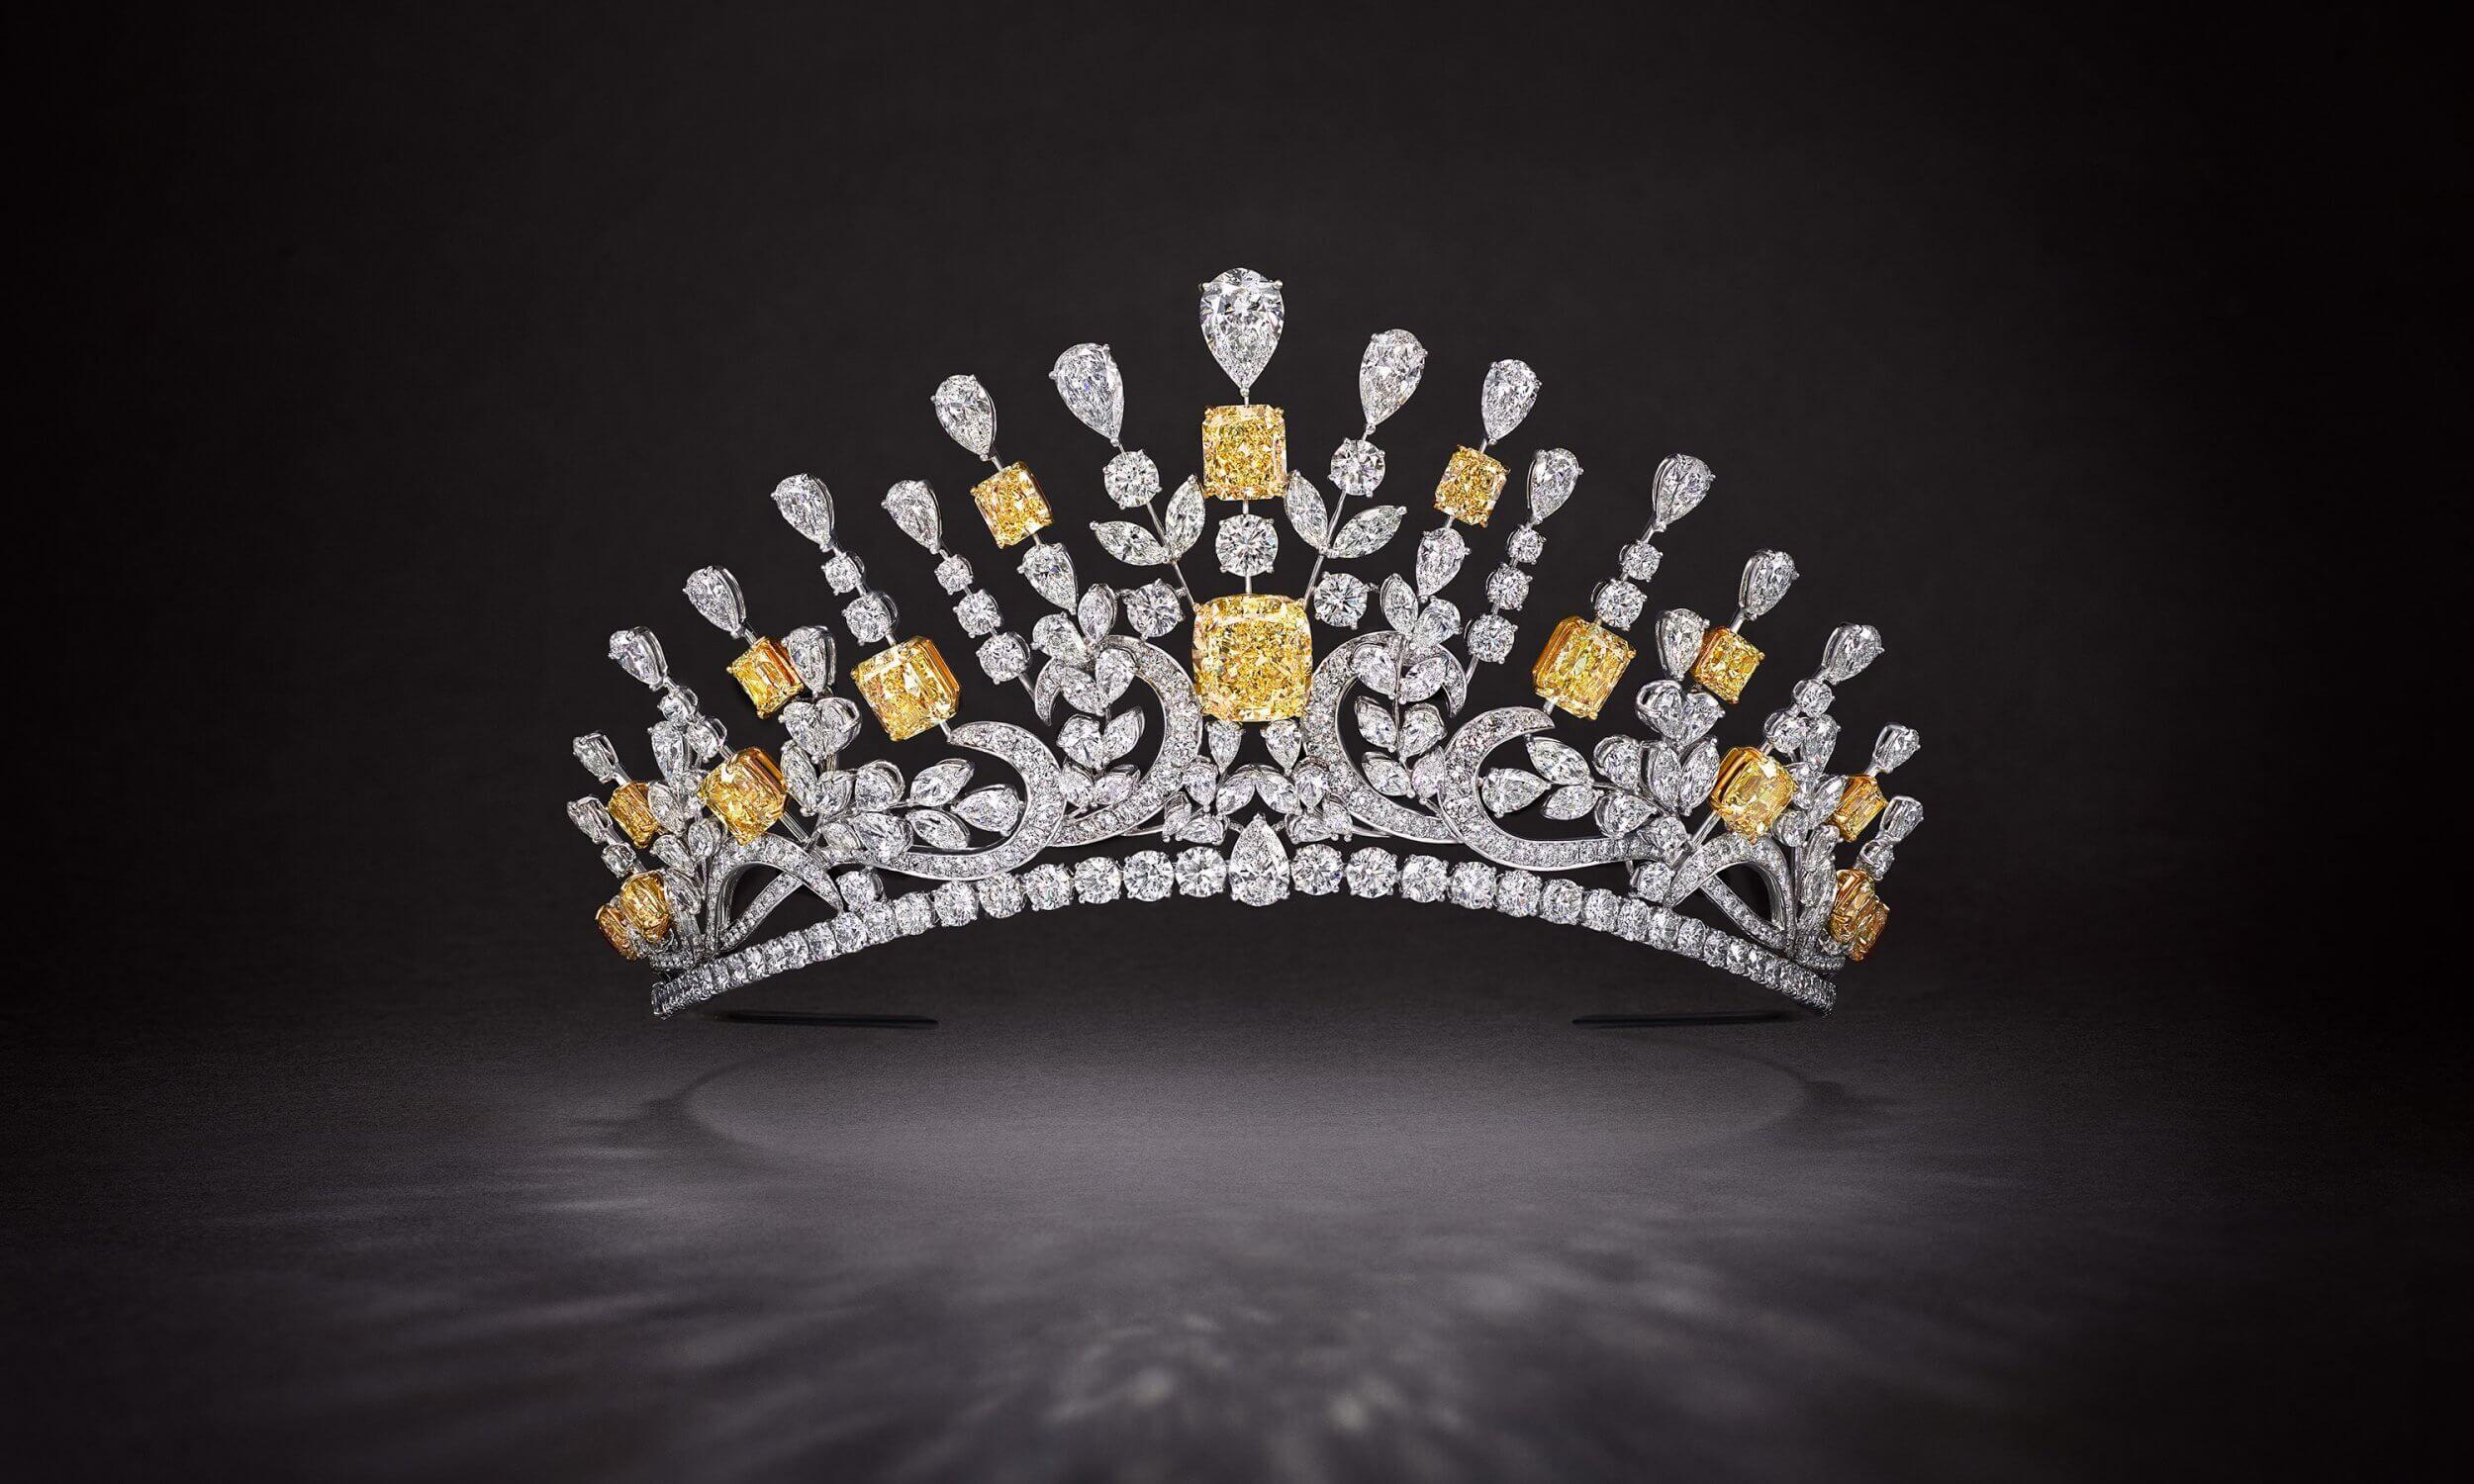 Graff 177.6 ct yellow and white diamond tiara